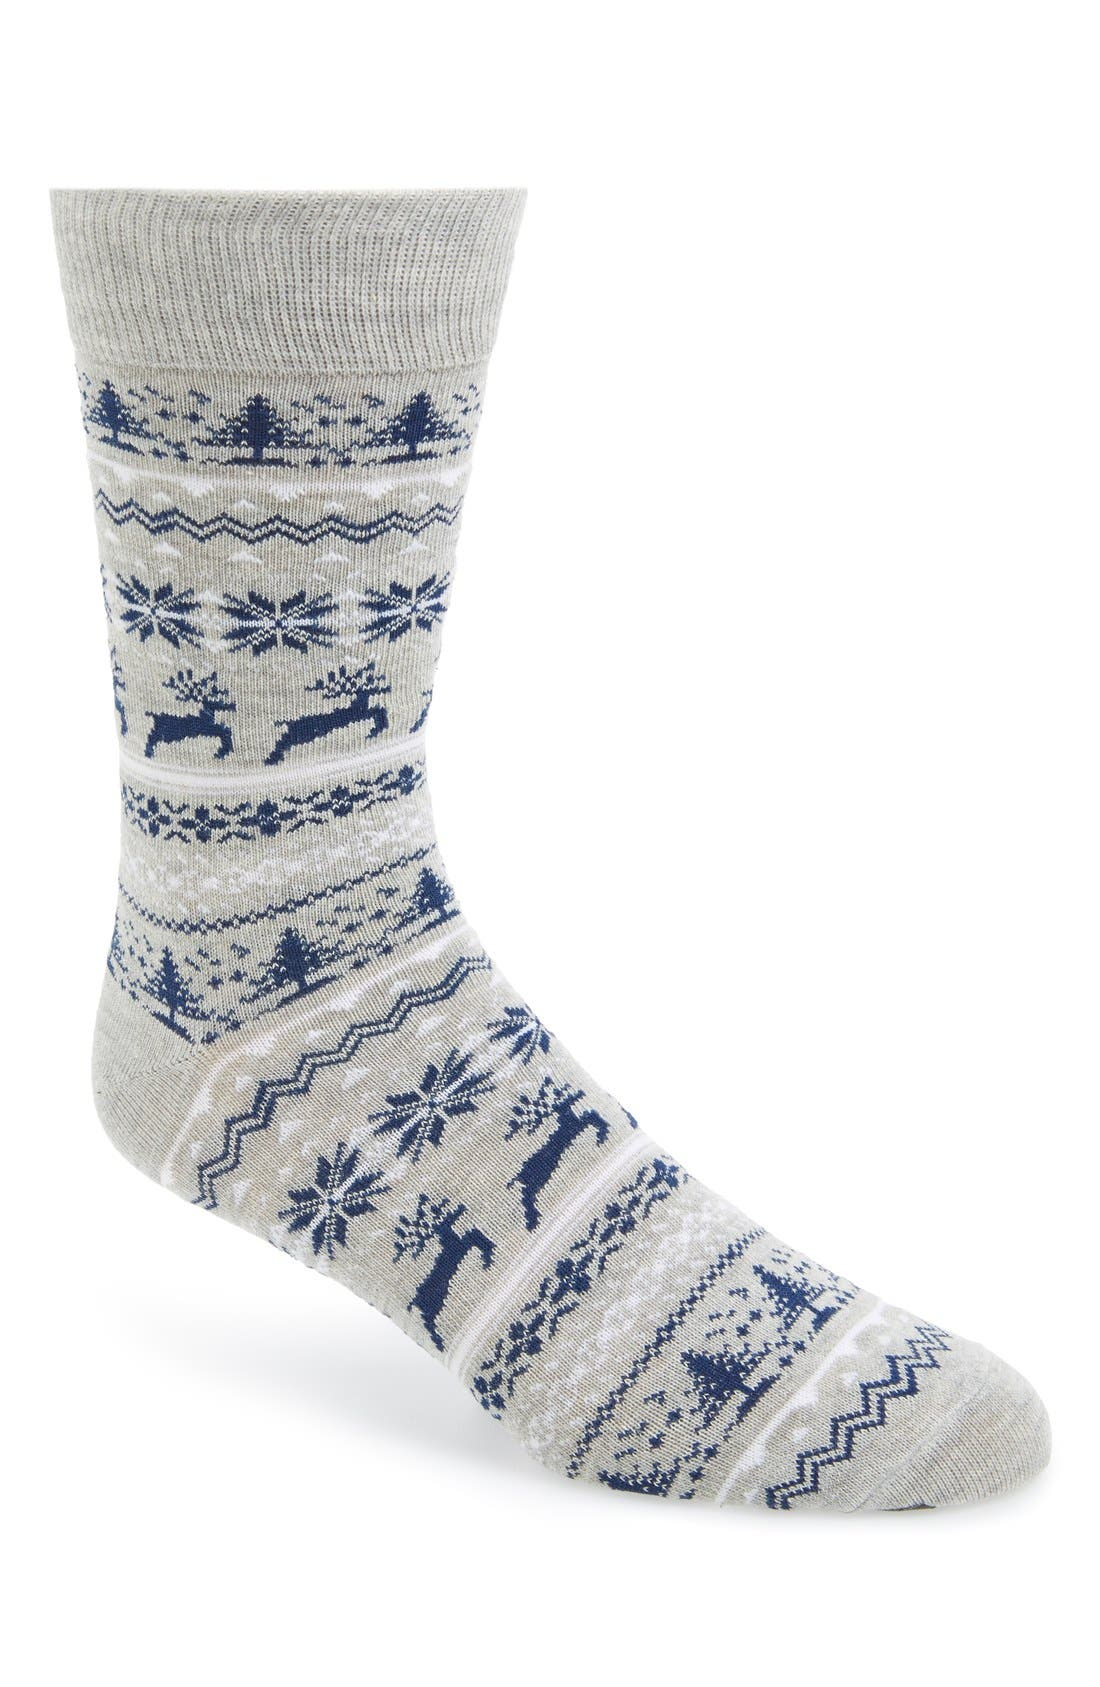 Nordic Pattern Socks, Main, color, 020